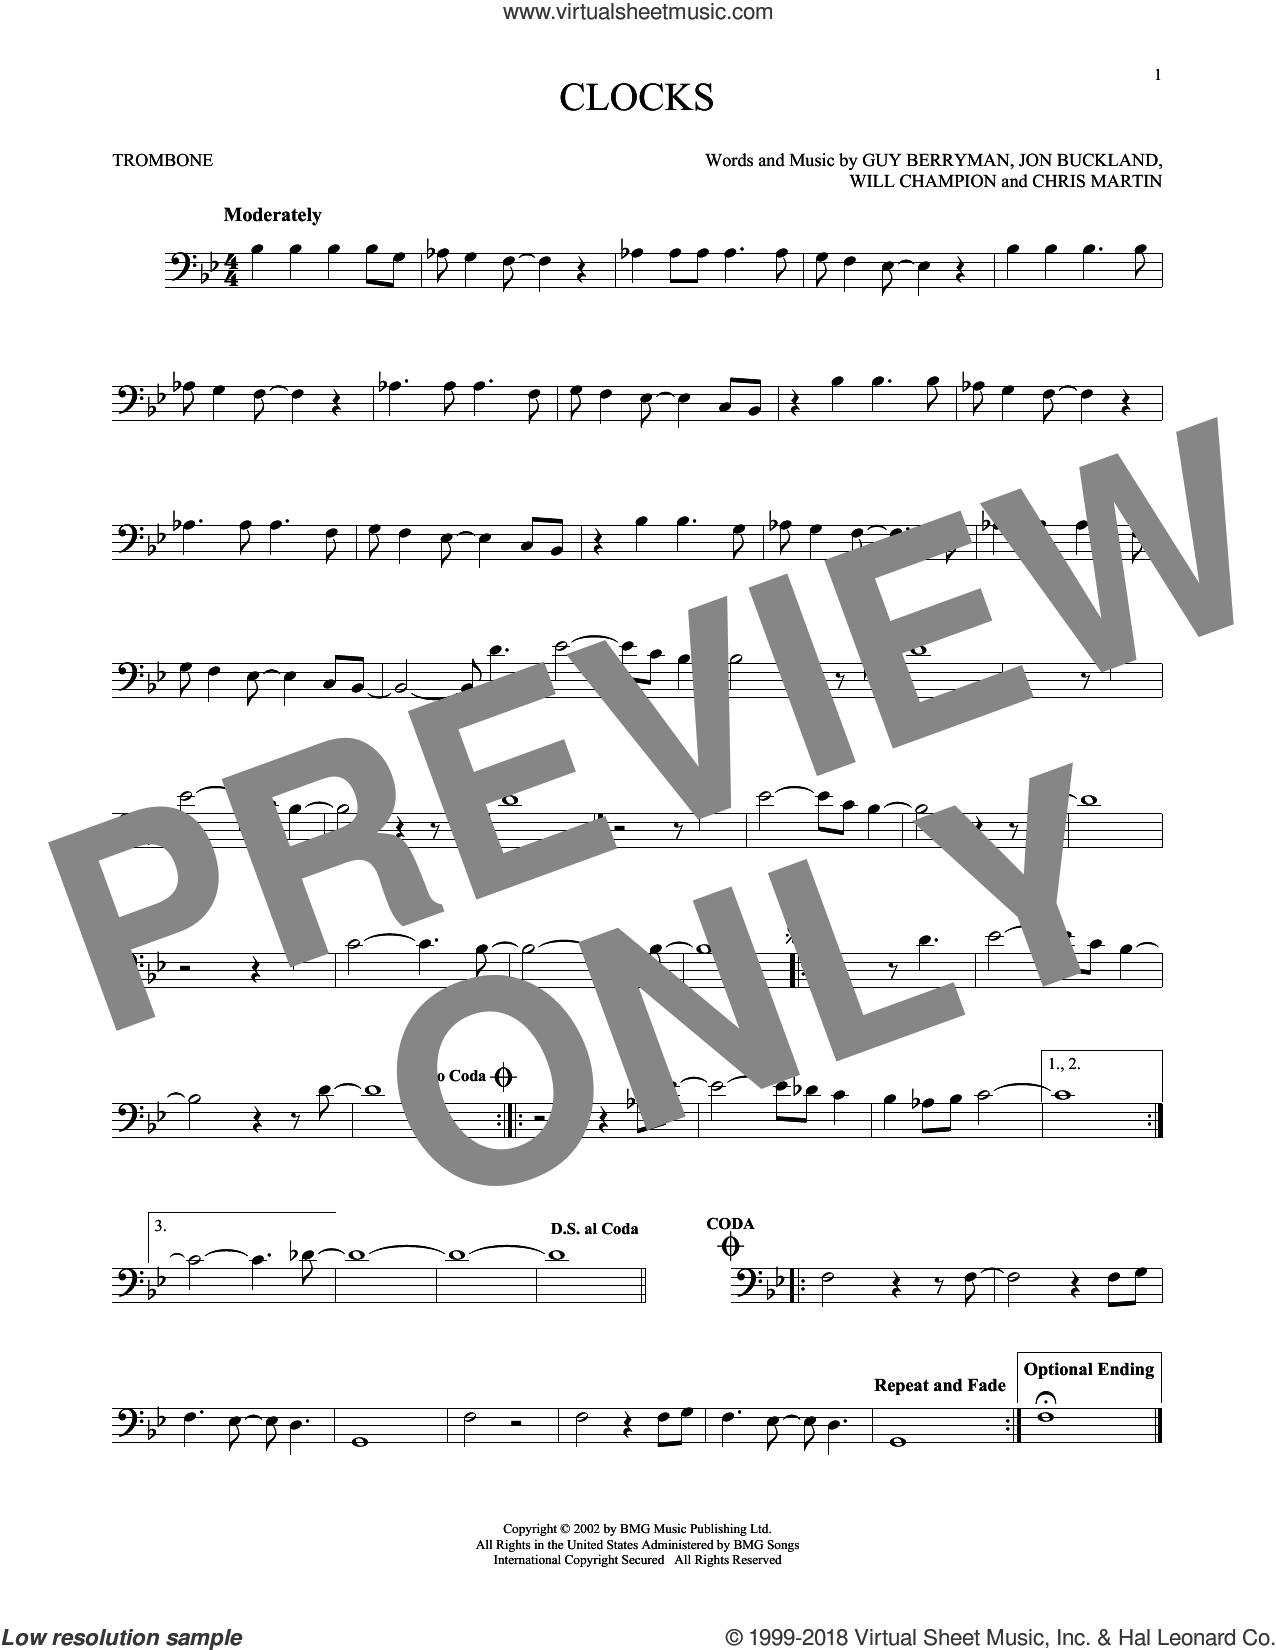 Clocks sheet music for trombone solo by Chris Martin, Coldplay, Guy Berryman, Jon Buckland and Will Champion, intermediate skill level